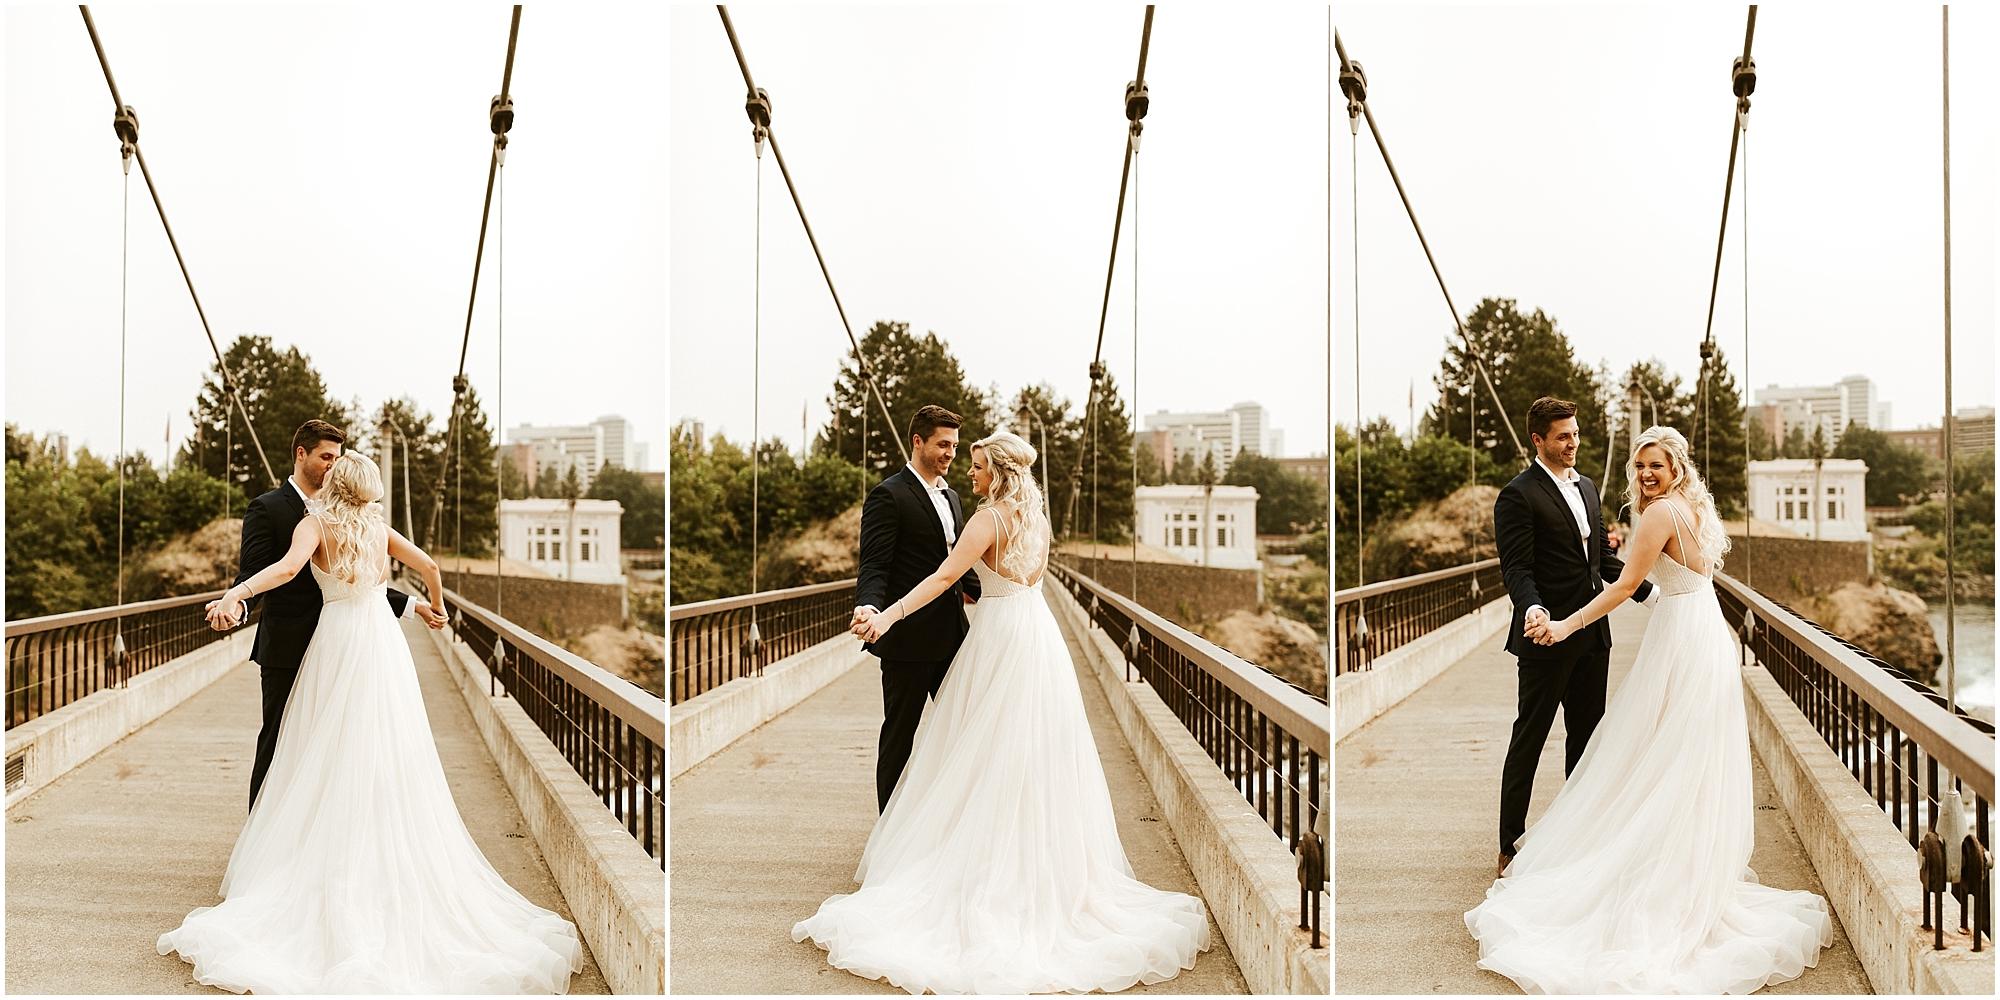 Chateau Rive Spokane Wedding Cassie Trottier Photography1043.jpg